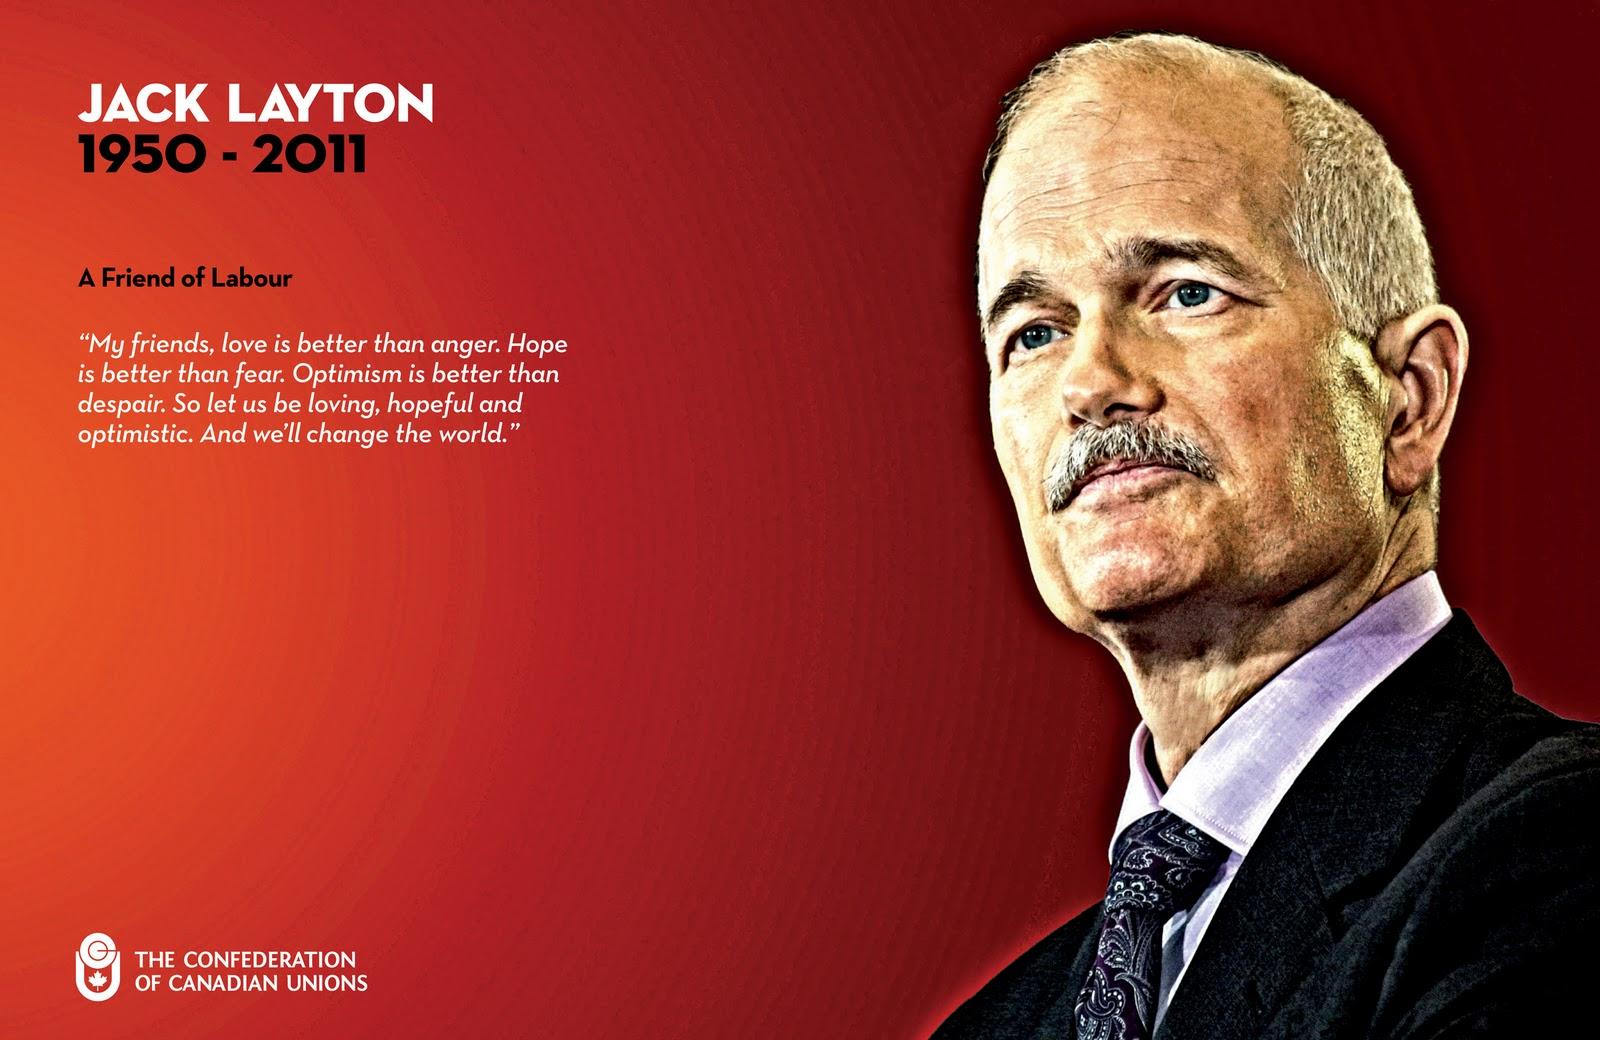 Jack Layton Net Worth